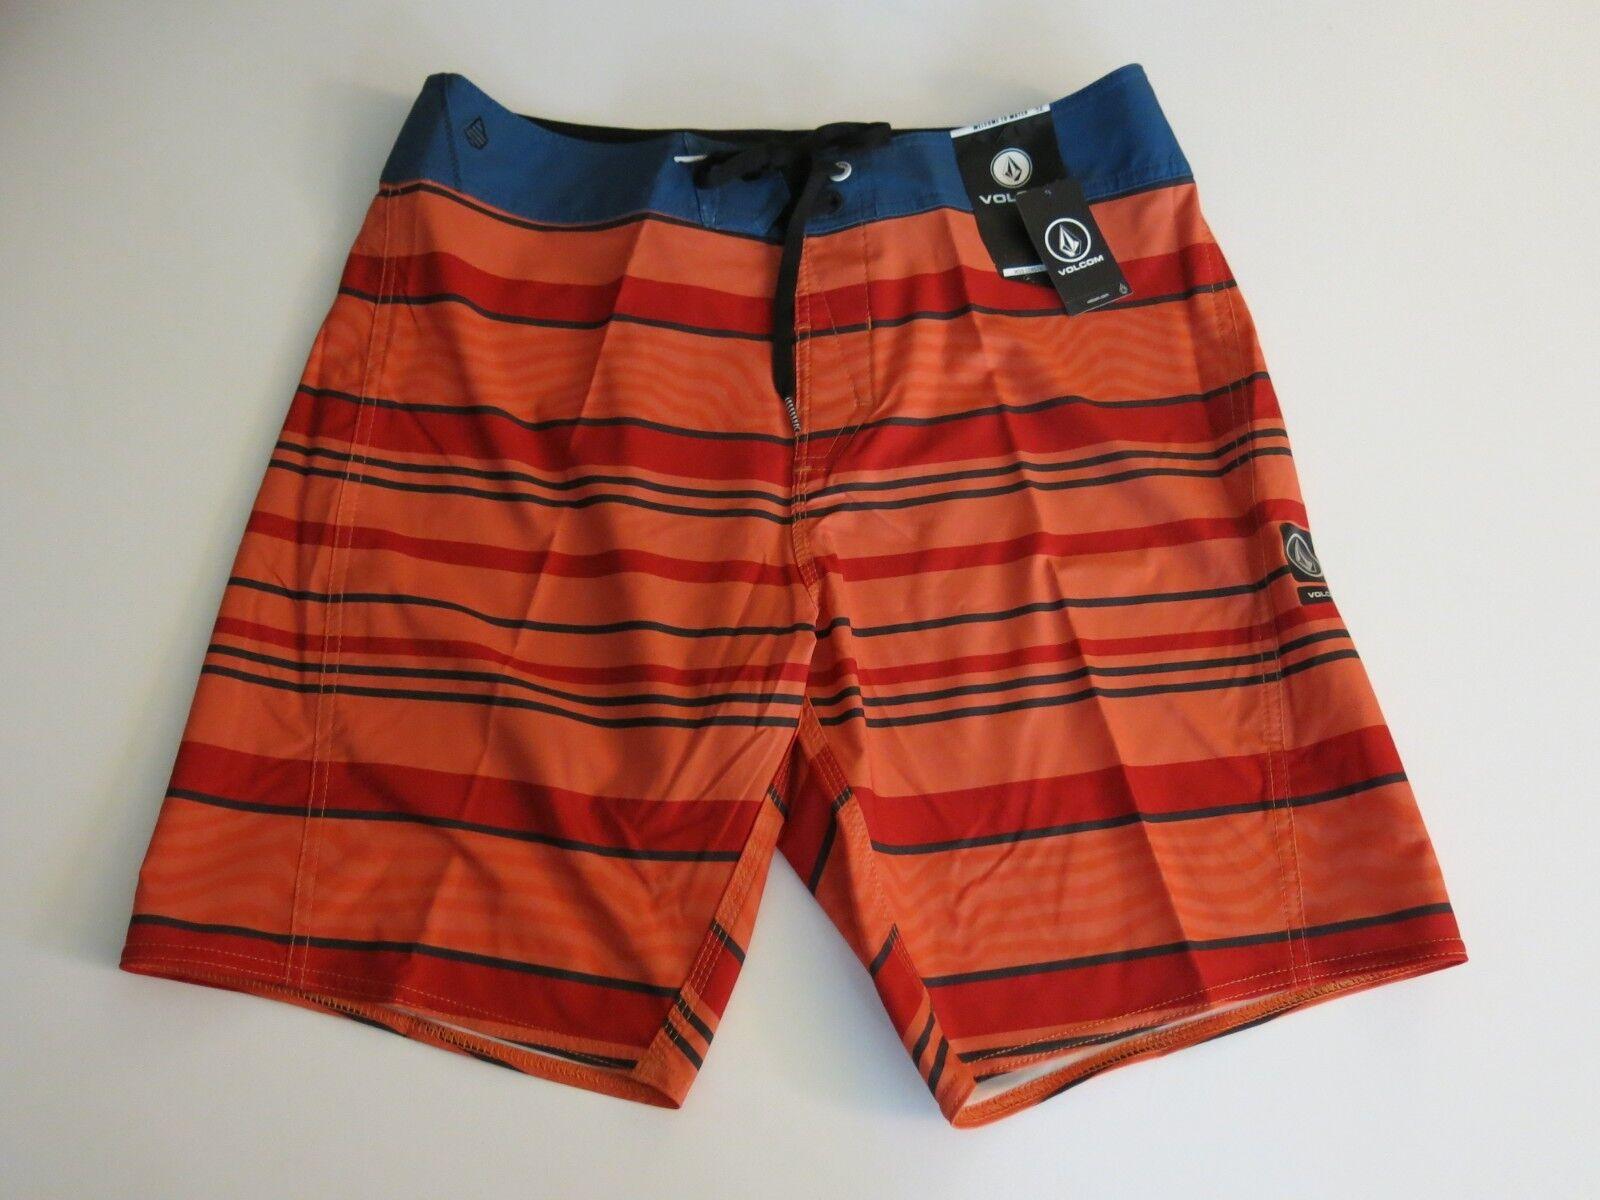 Volcom Surf Men's 36 Board Shorts Sixta Stretch orange Red bluee Stripe NWT